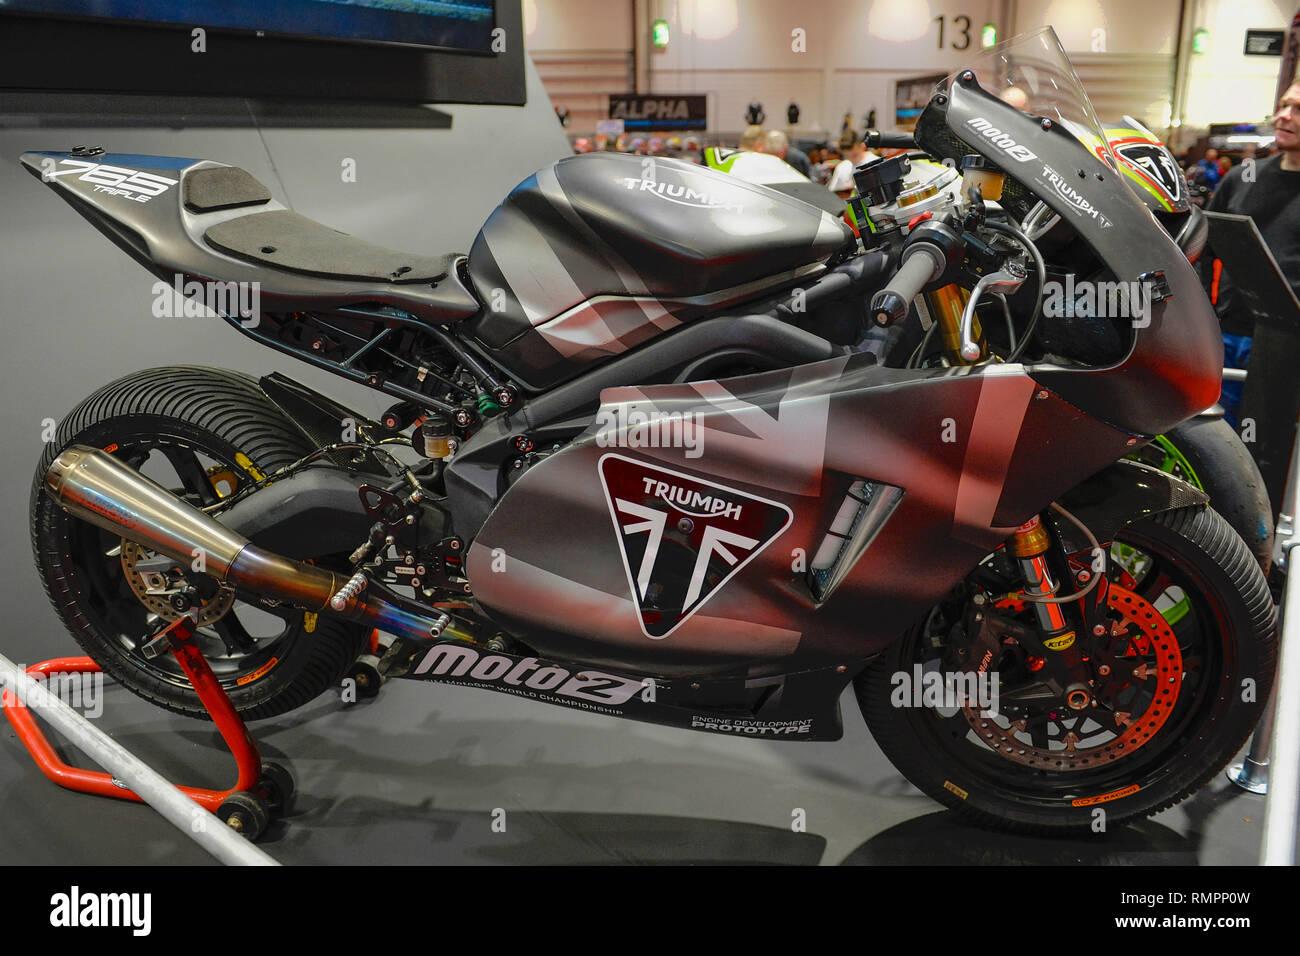 London Uk 15th Feb 2019 A Prototype Triumph Motorbike On Display